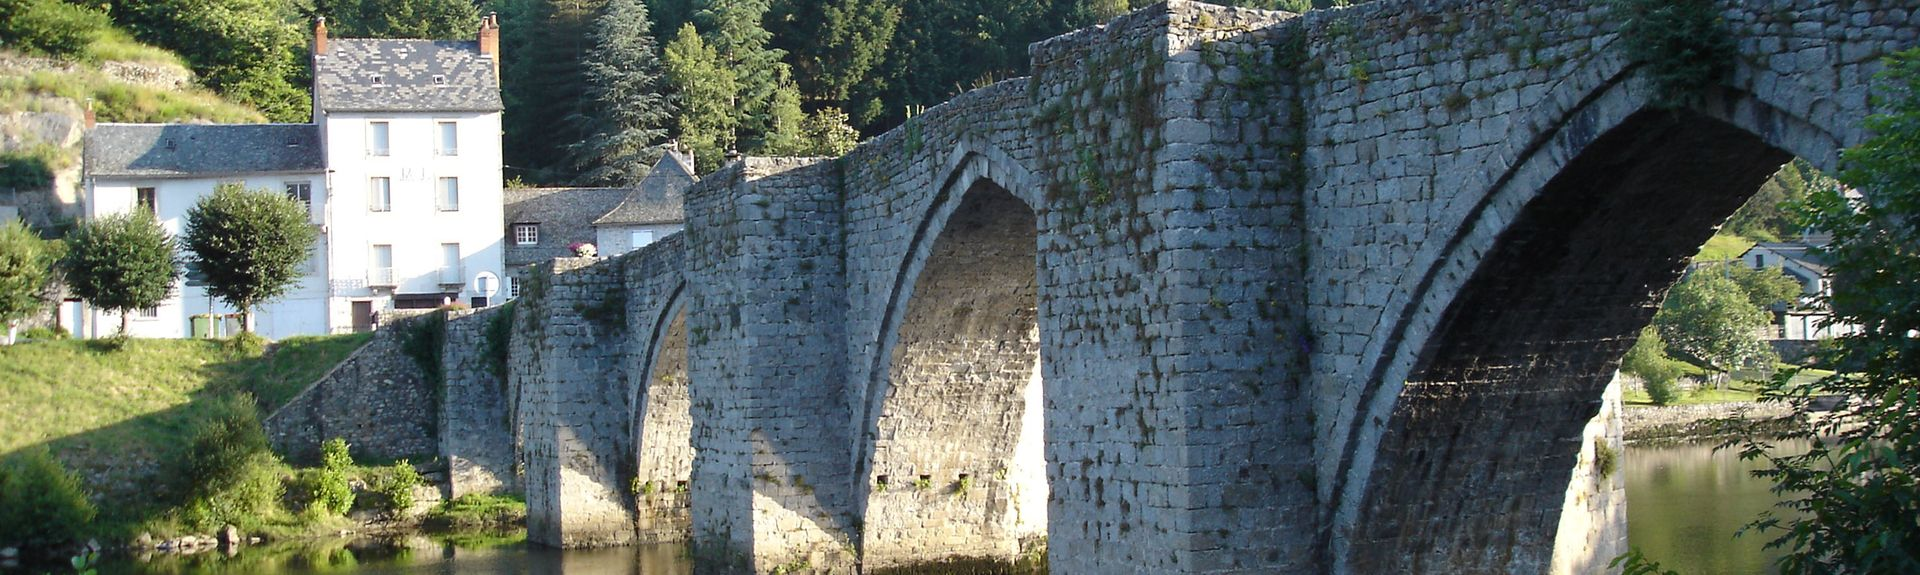 Golinhac, Occitanie, Frankreich